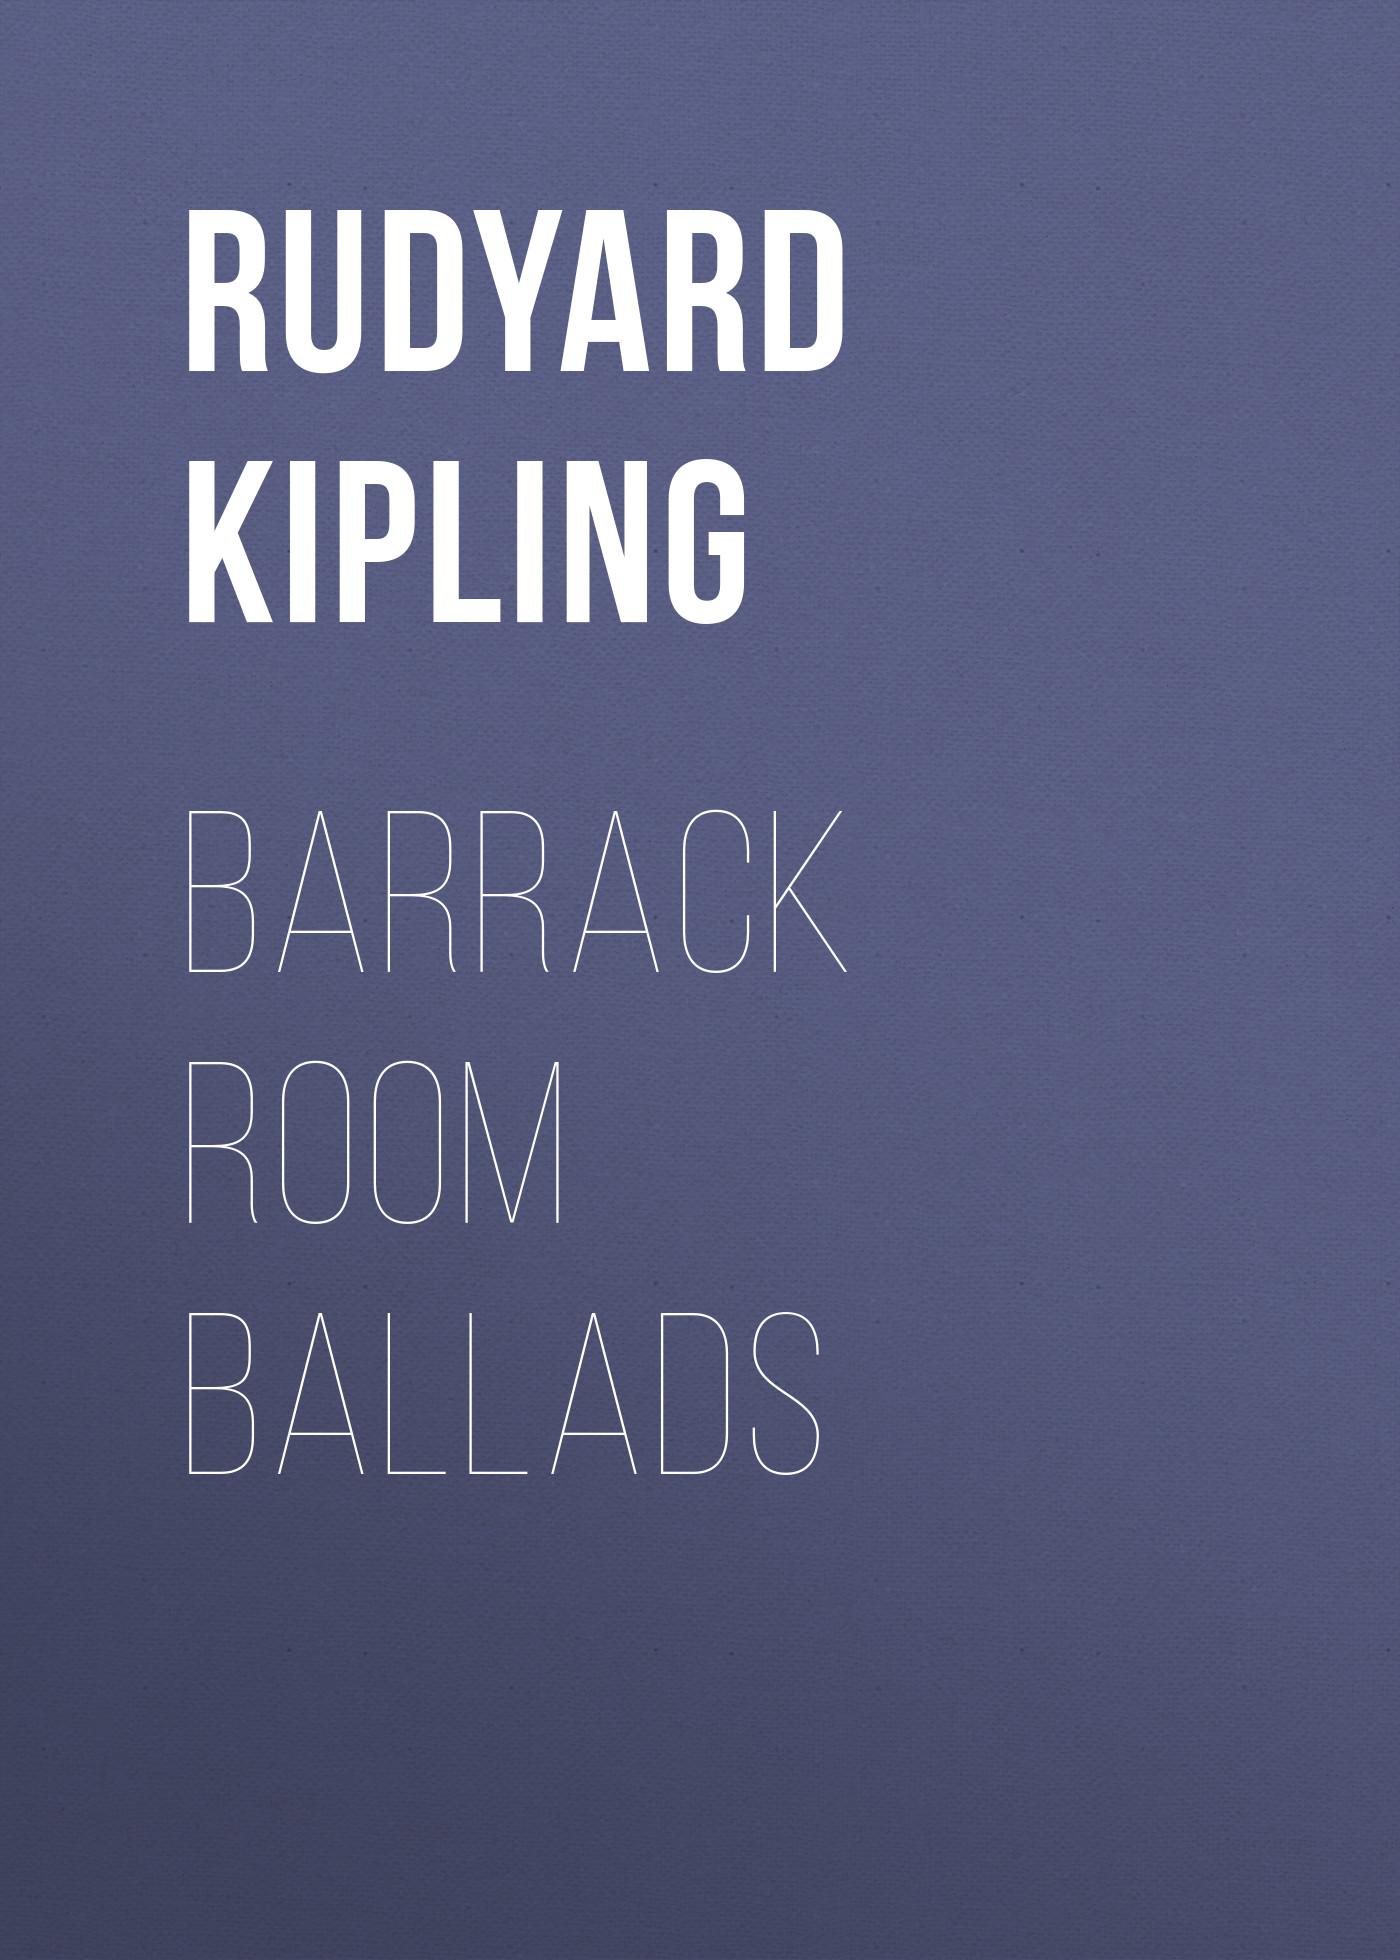 Редьярд Киплинг Barrack Room Ballads